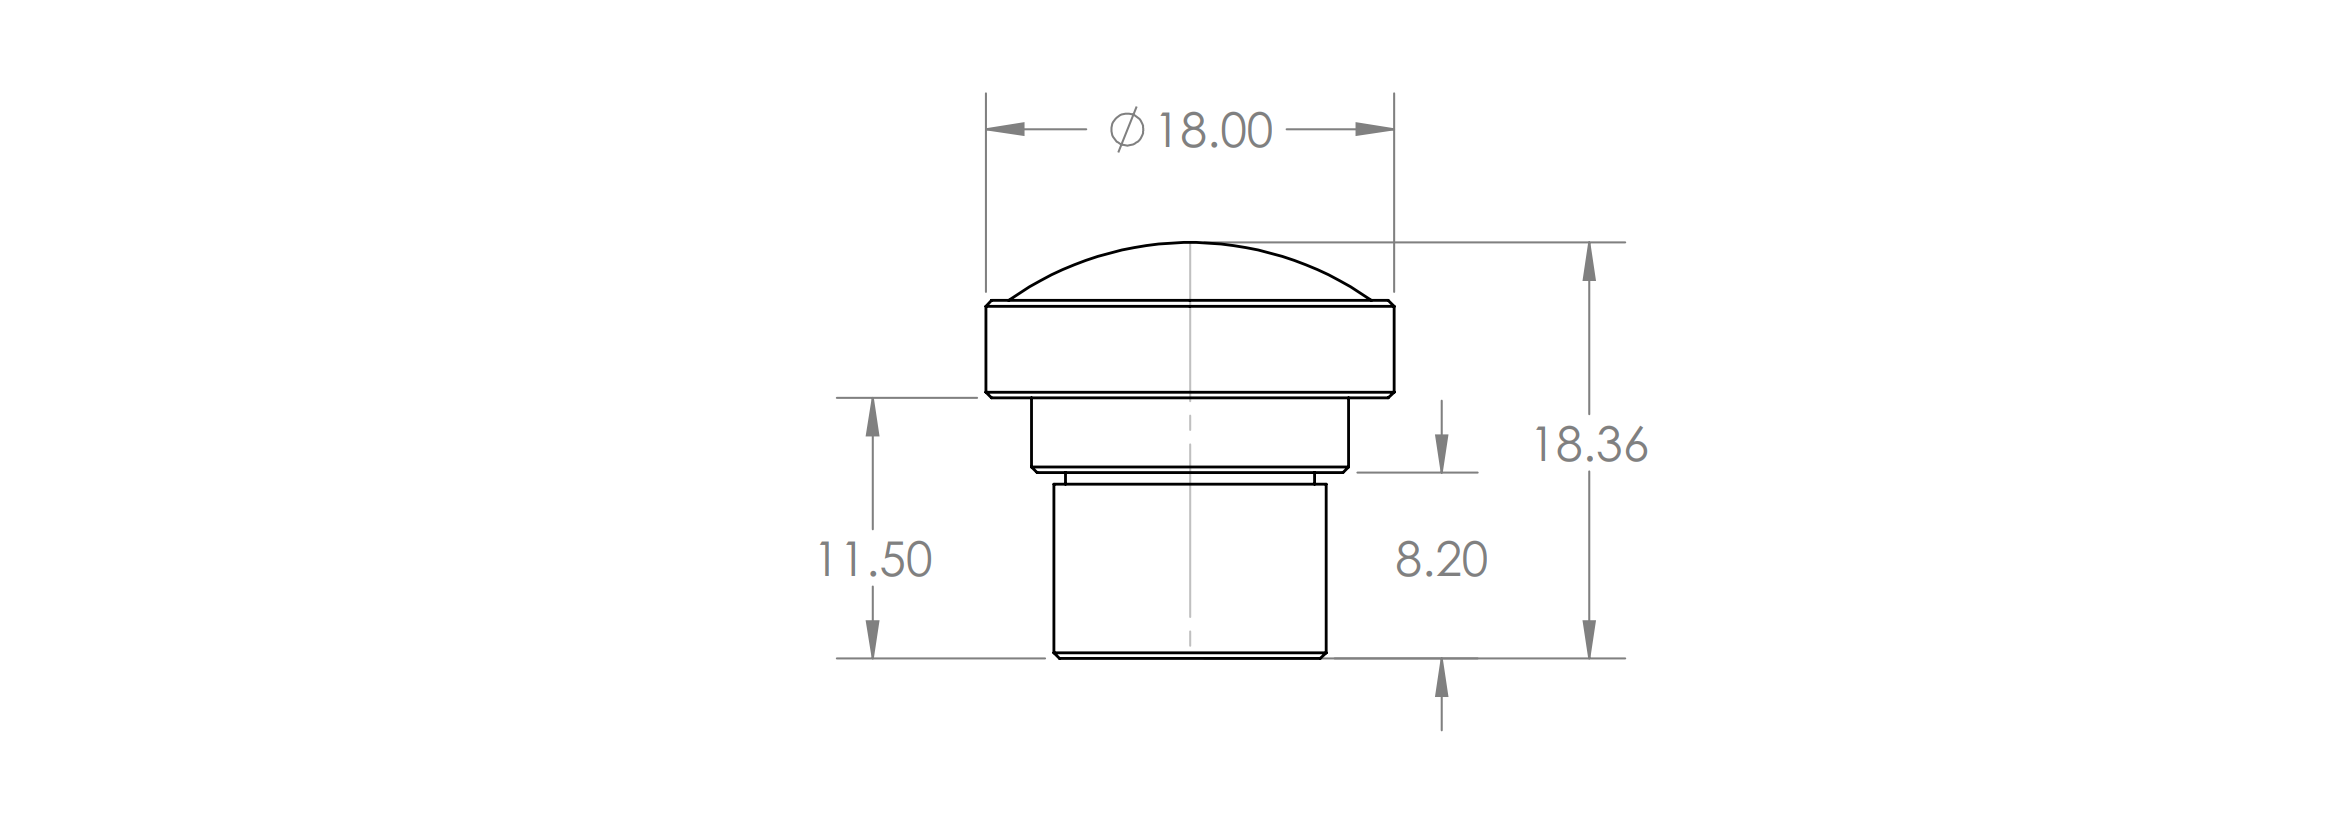 L078-2_78-M12_dimensions.png